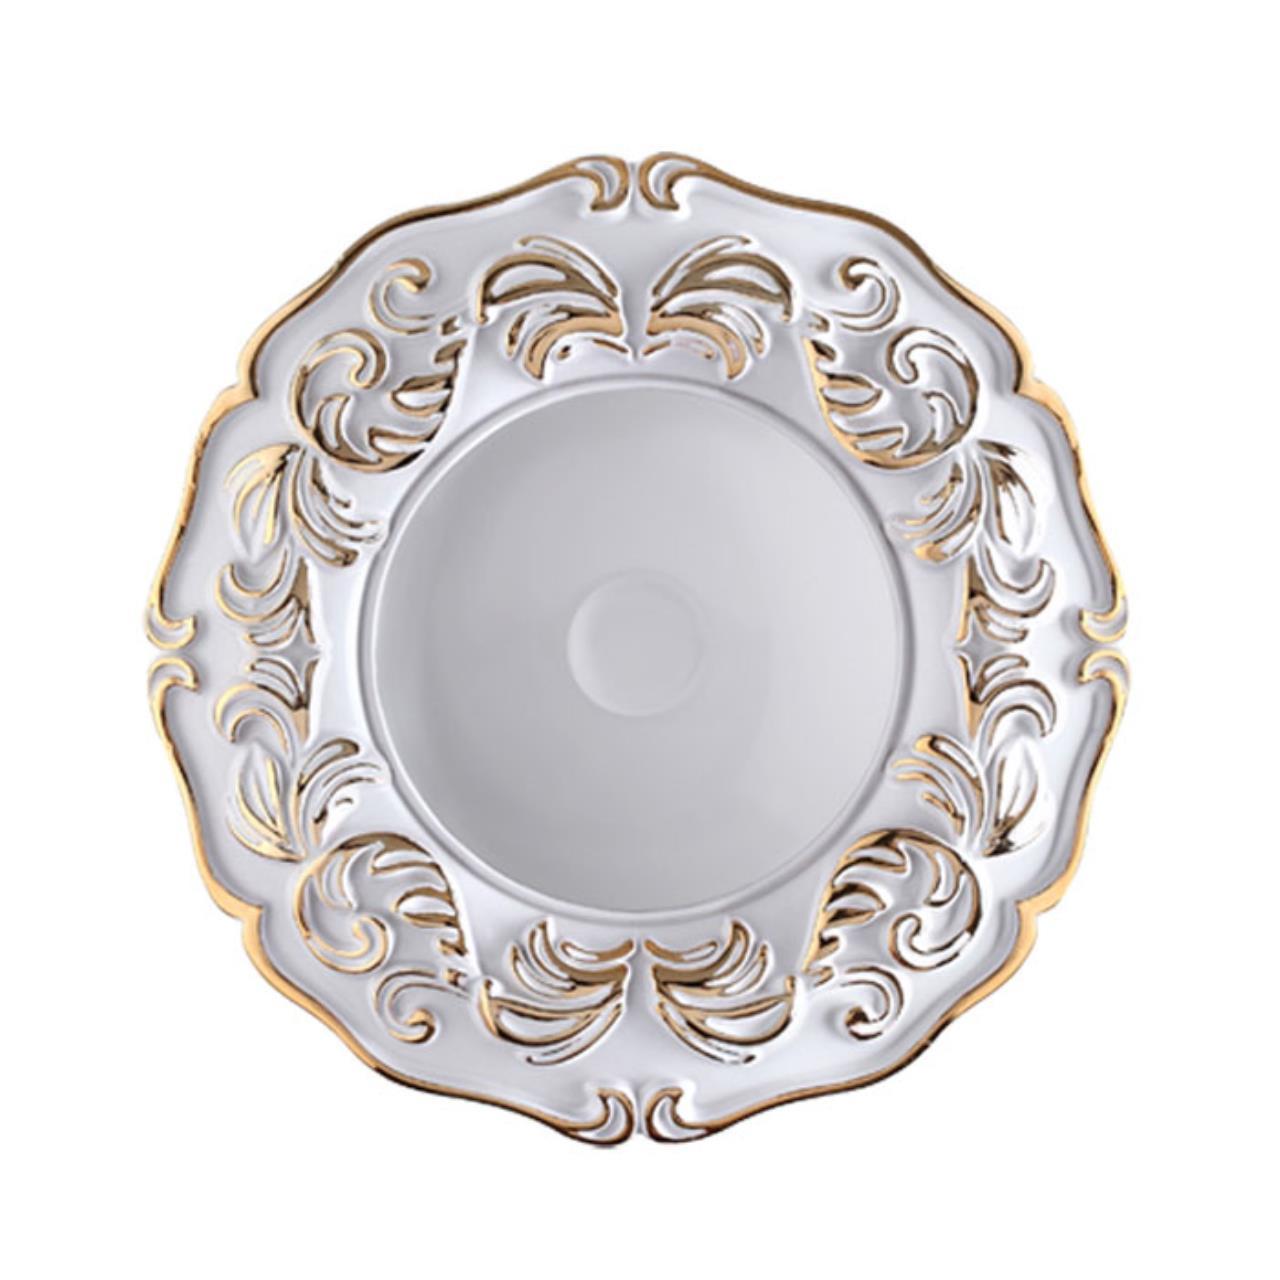 357605 SPOT NT18 141 белый/золото Встраиваемый светильник IP20 LED 3000K 7W 85-265V NOVEL